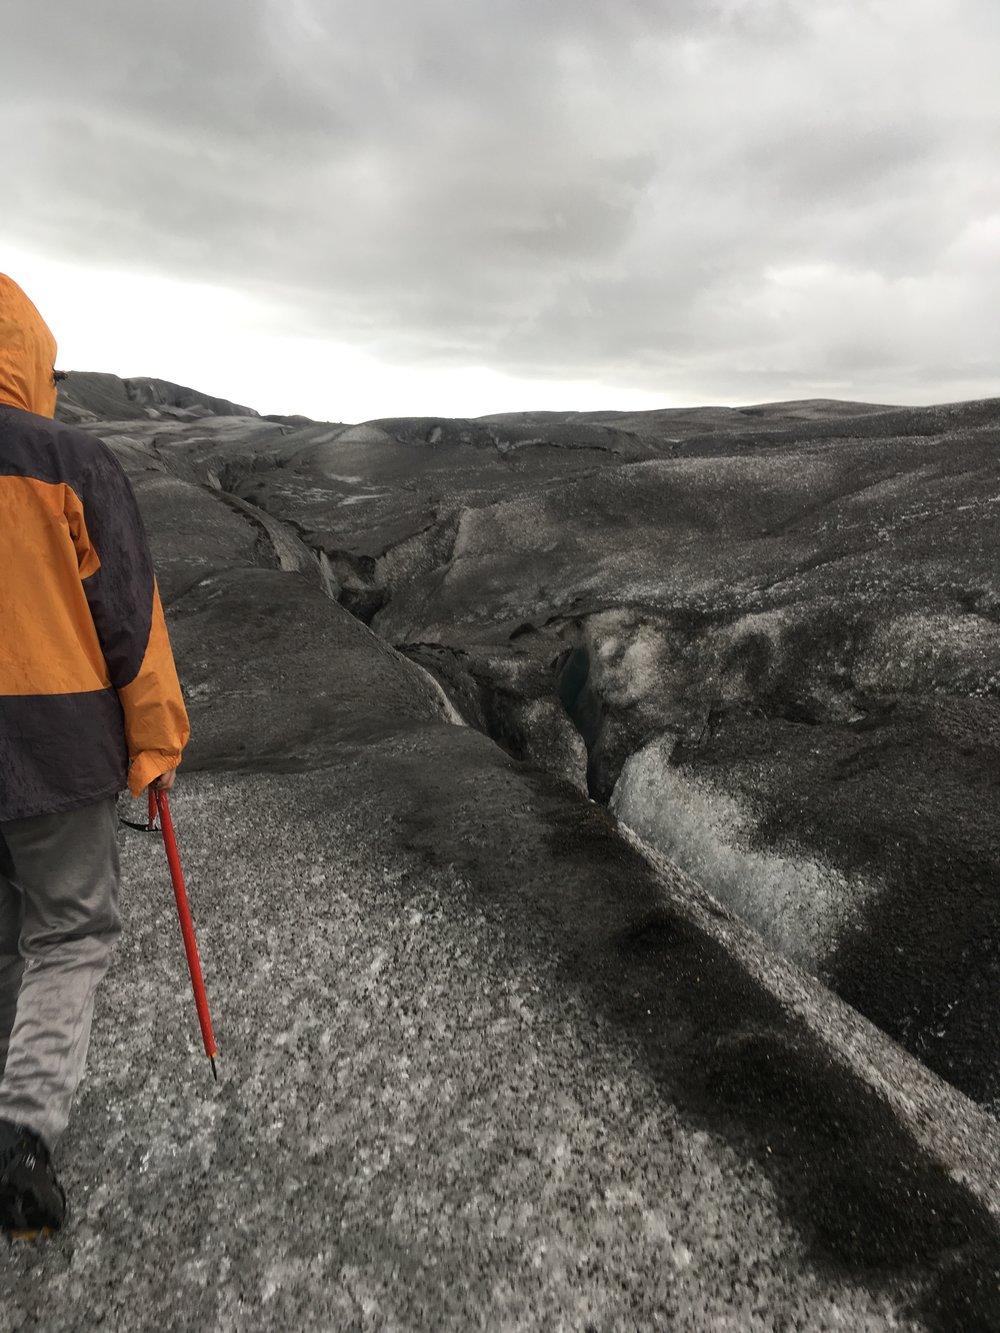 Trekking on Solheimajokull, a glacier near Vik, Iceland.